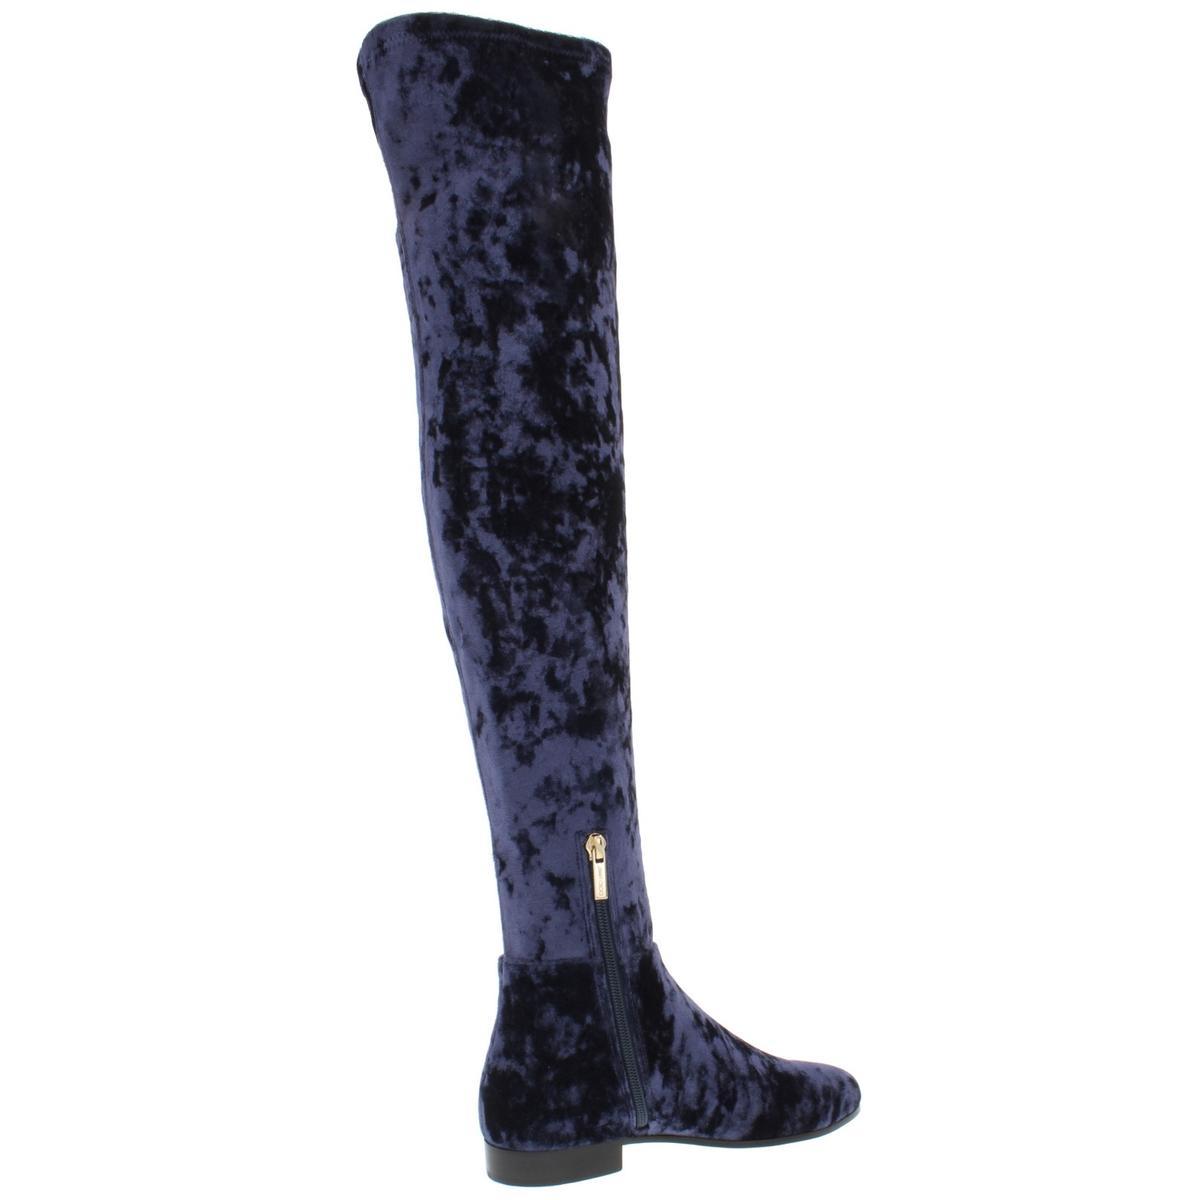 Jimmy-Choo-Womens-Myren-Navy-Over-The-Knee-Boots-Shoes-36-Medium-B-M-BHFO-1167 miniatuur 2